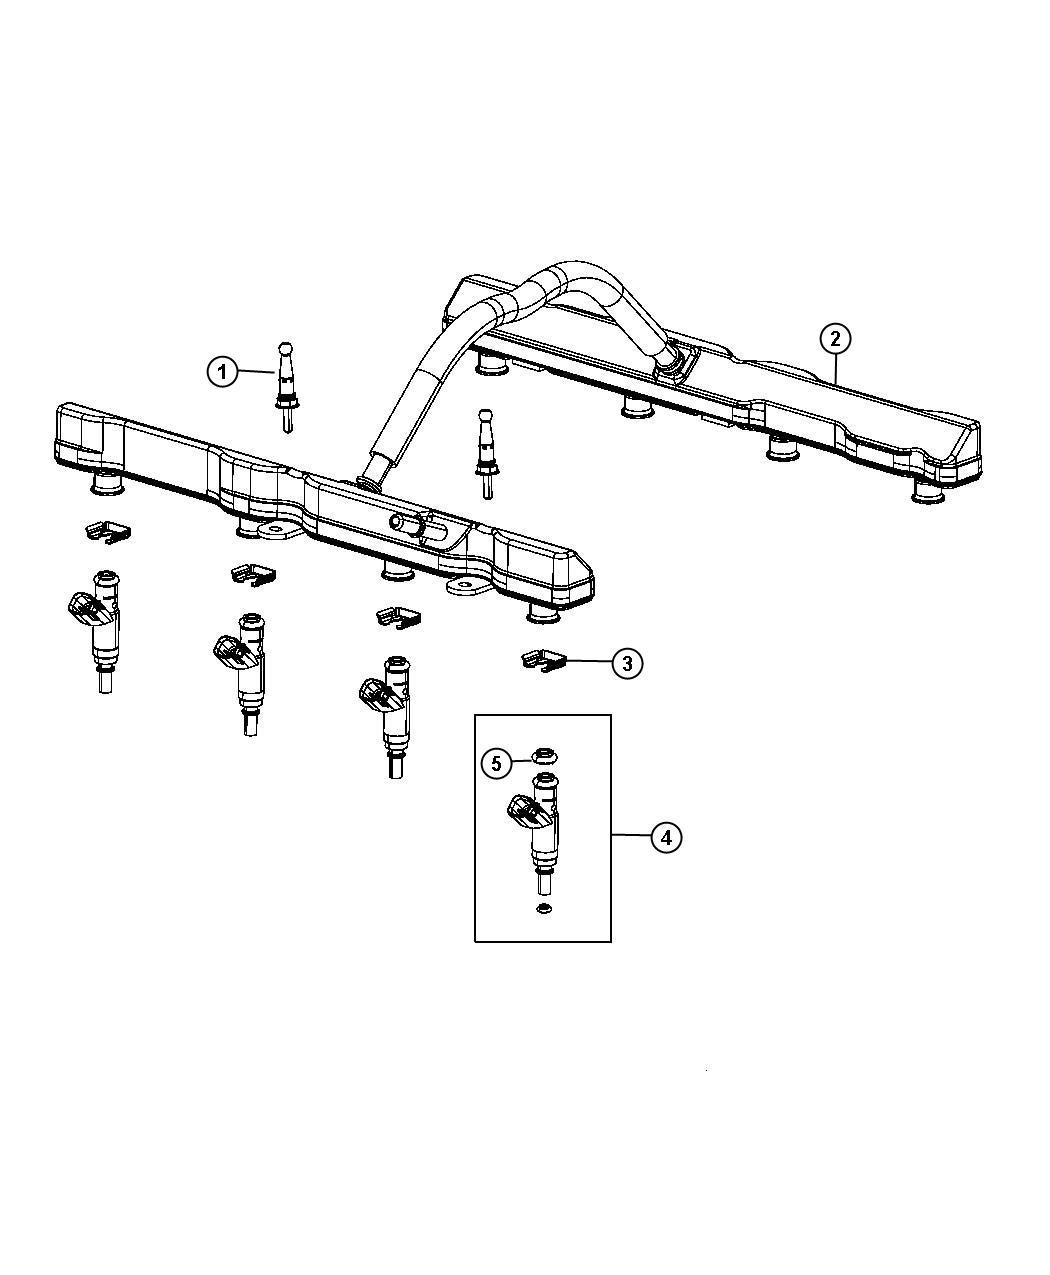 2004 acura tsx headlight wiring diagram